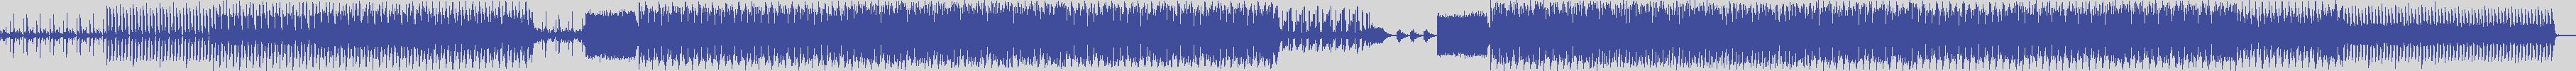 just_digital_records [JS1143] Homeboyz - Psyco [Rh Mental Mix] audio wave form